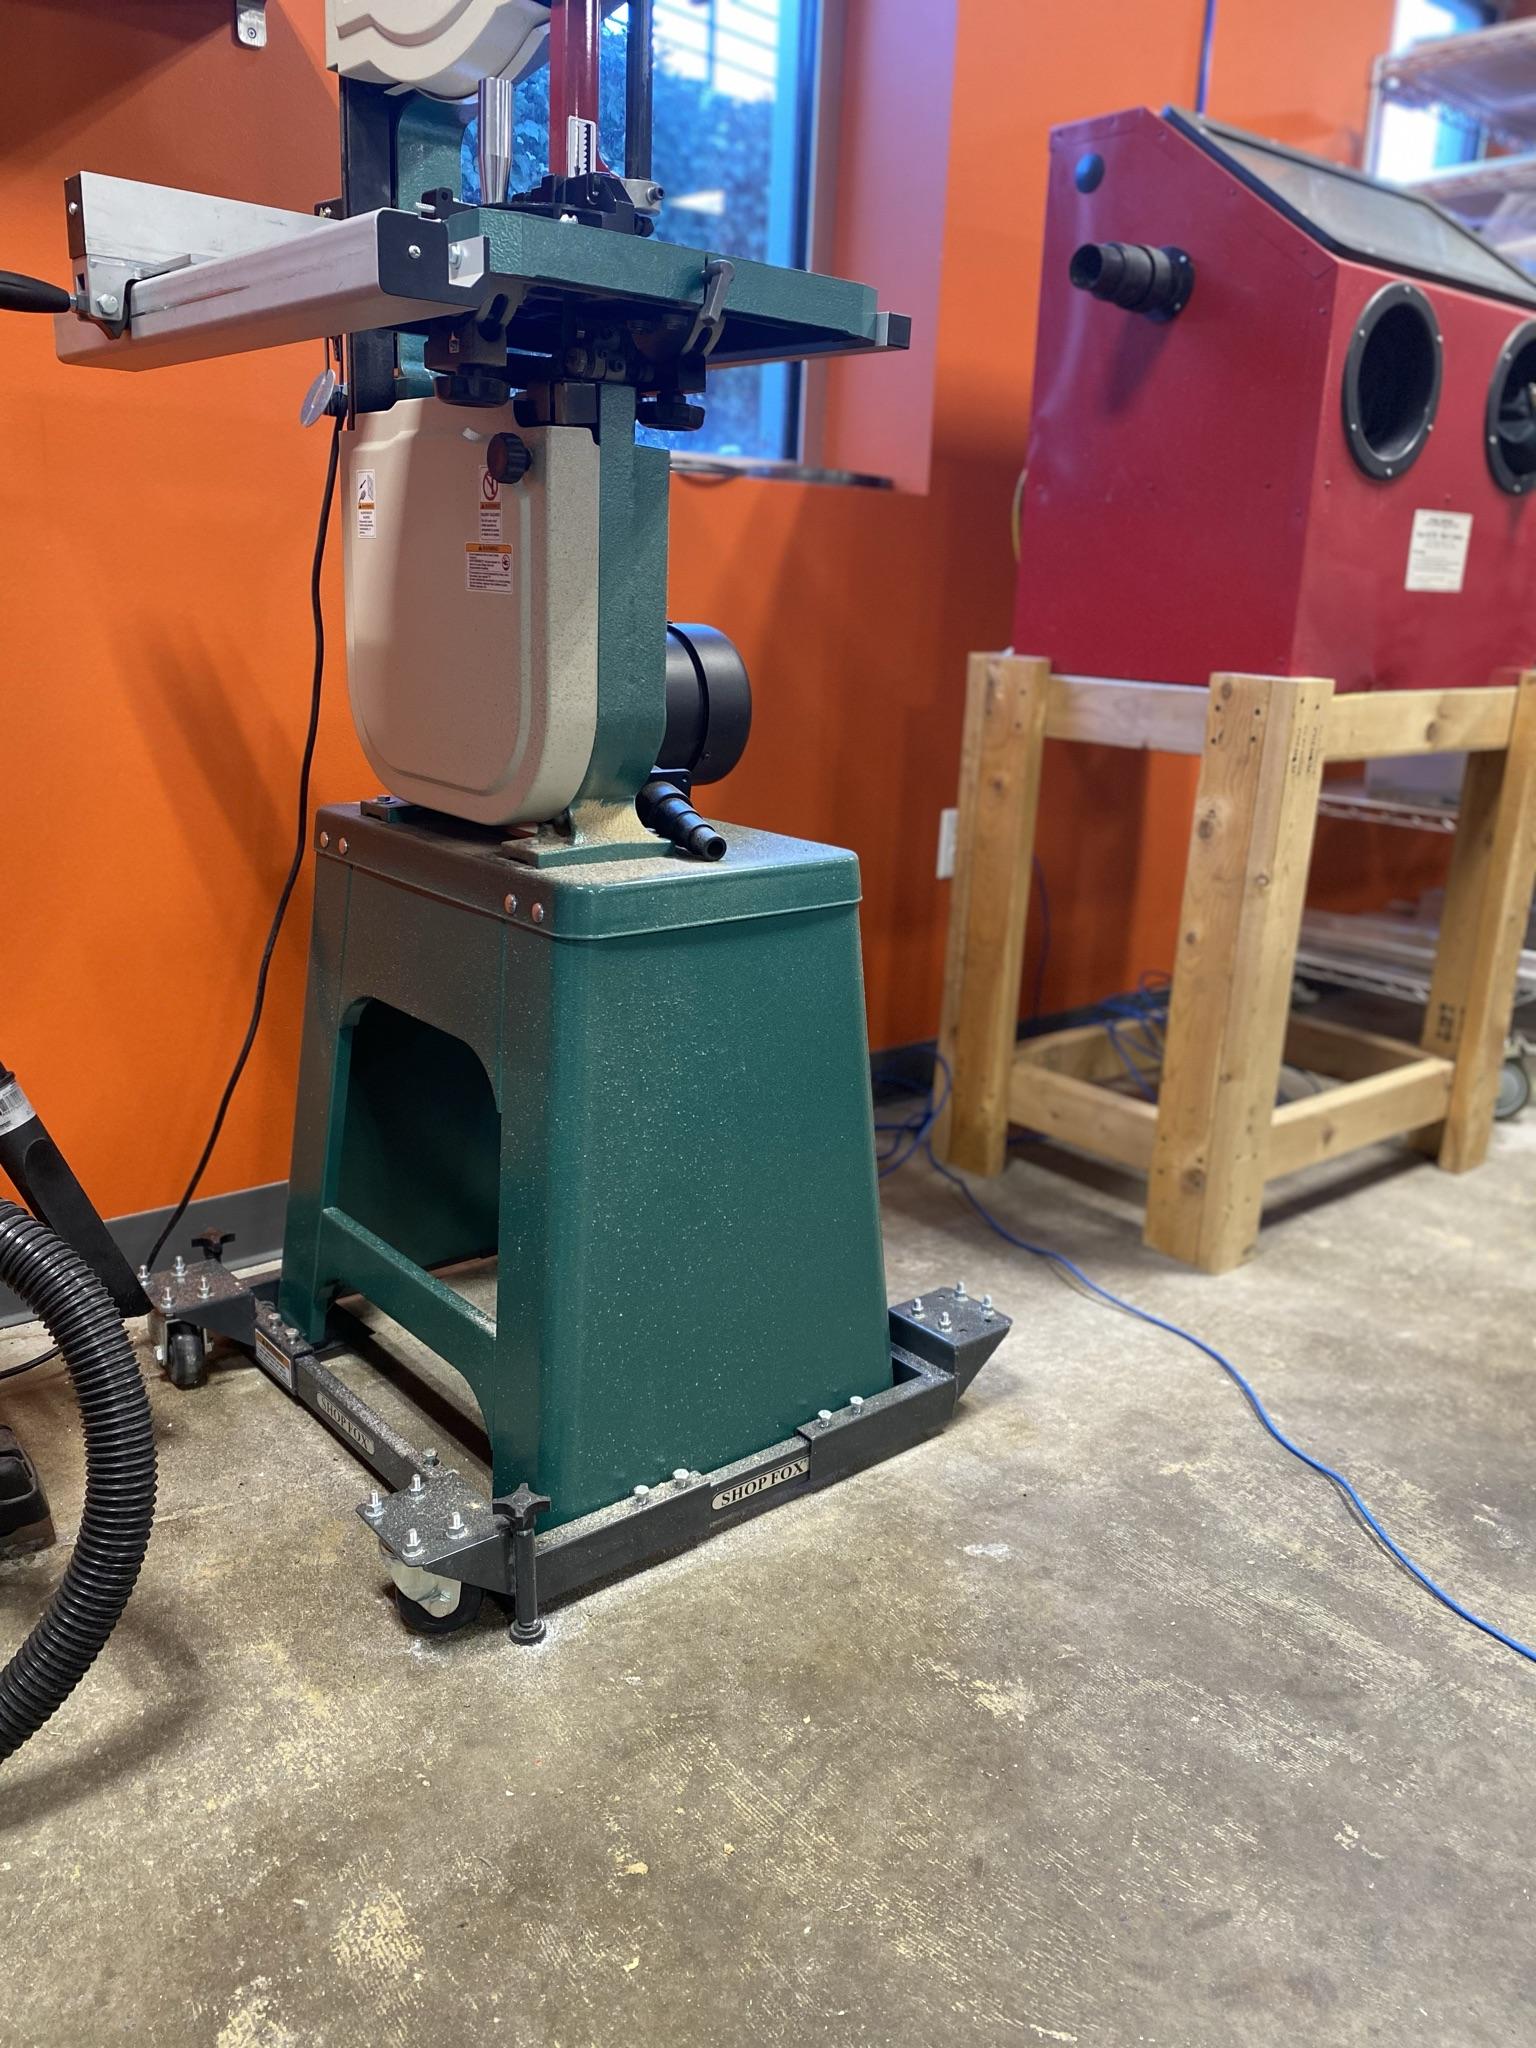 Agile Workspace - Drill Press On Wheels